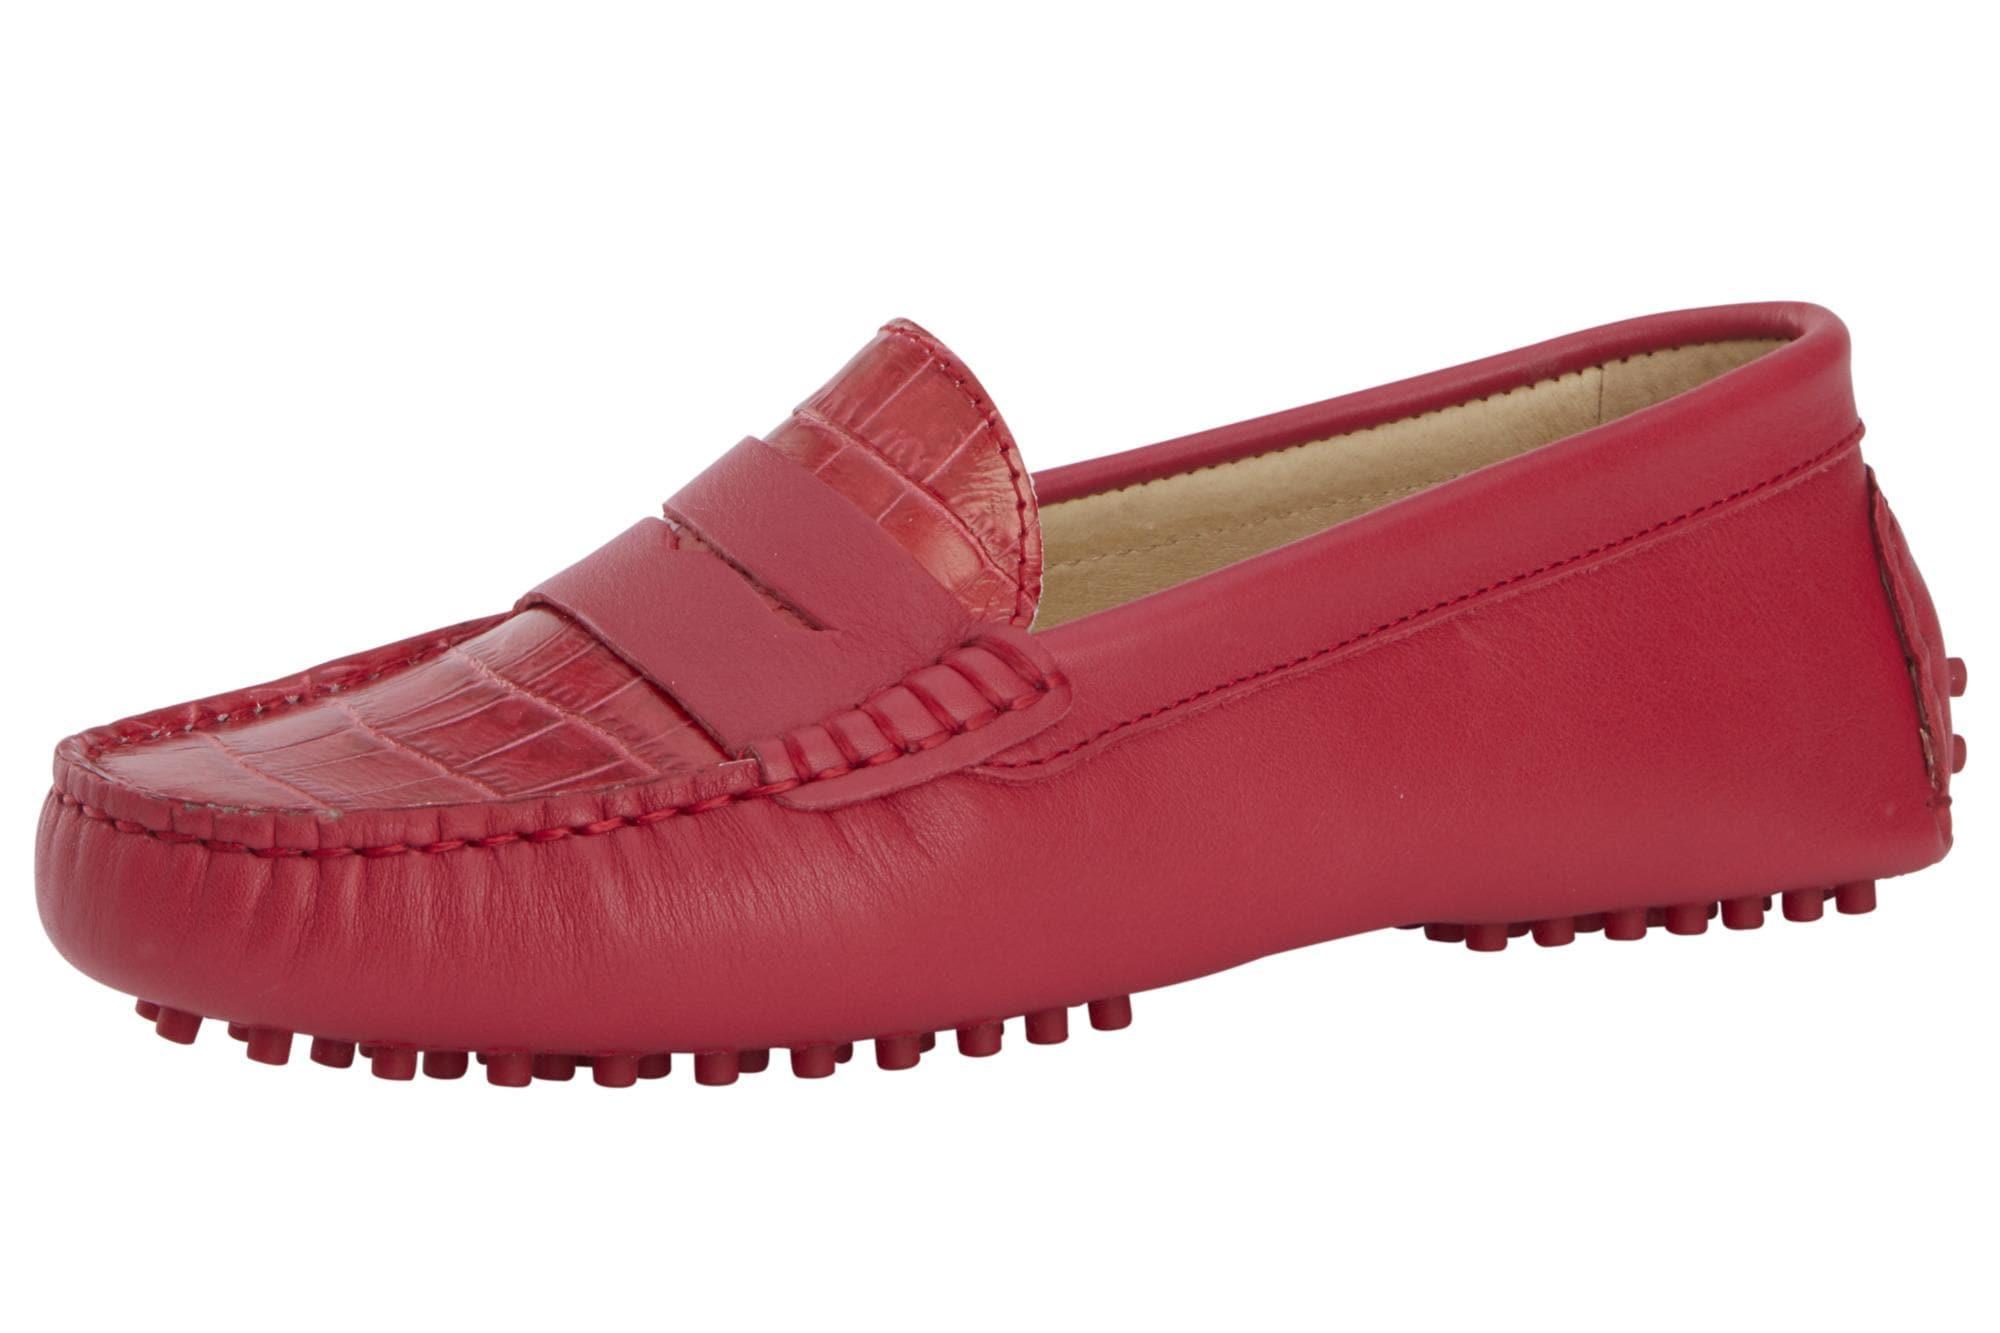 Mokassin | Schuhe > Mokassins | heine